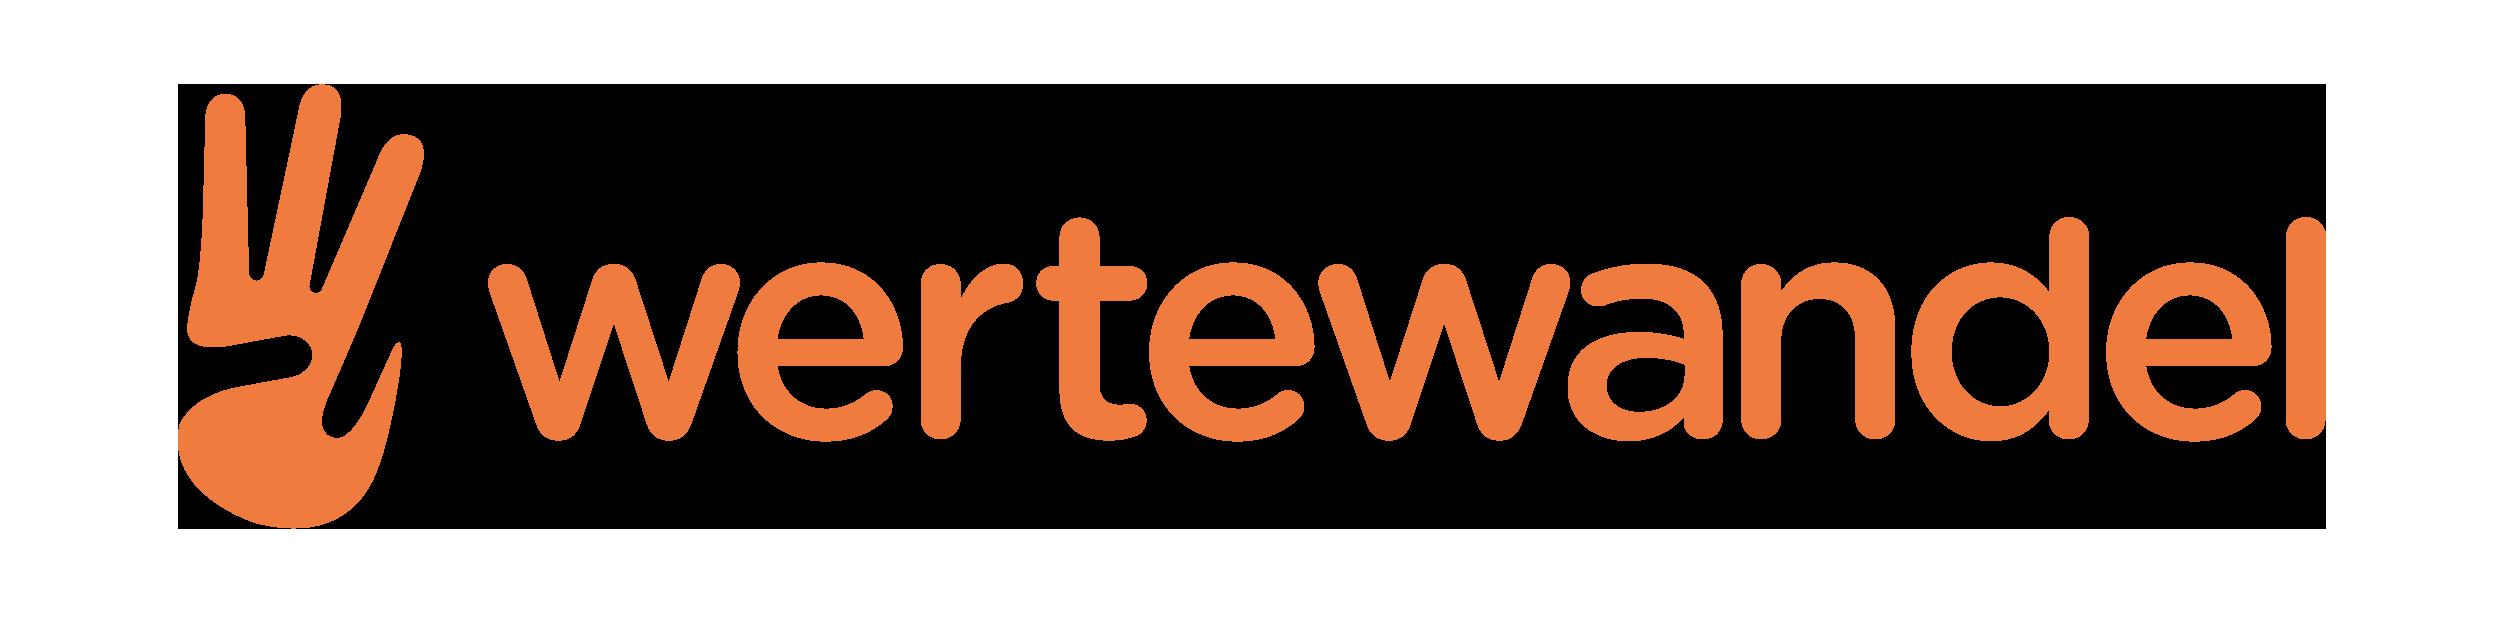 20170316_Wertewandel_Logo-orange.png